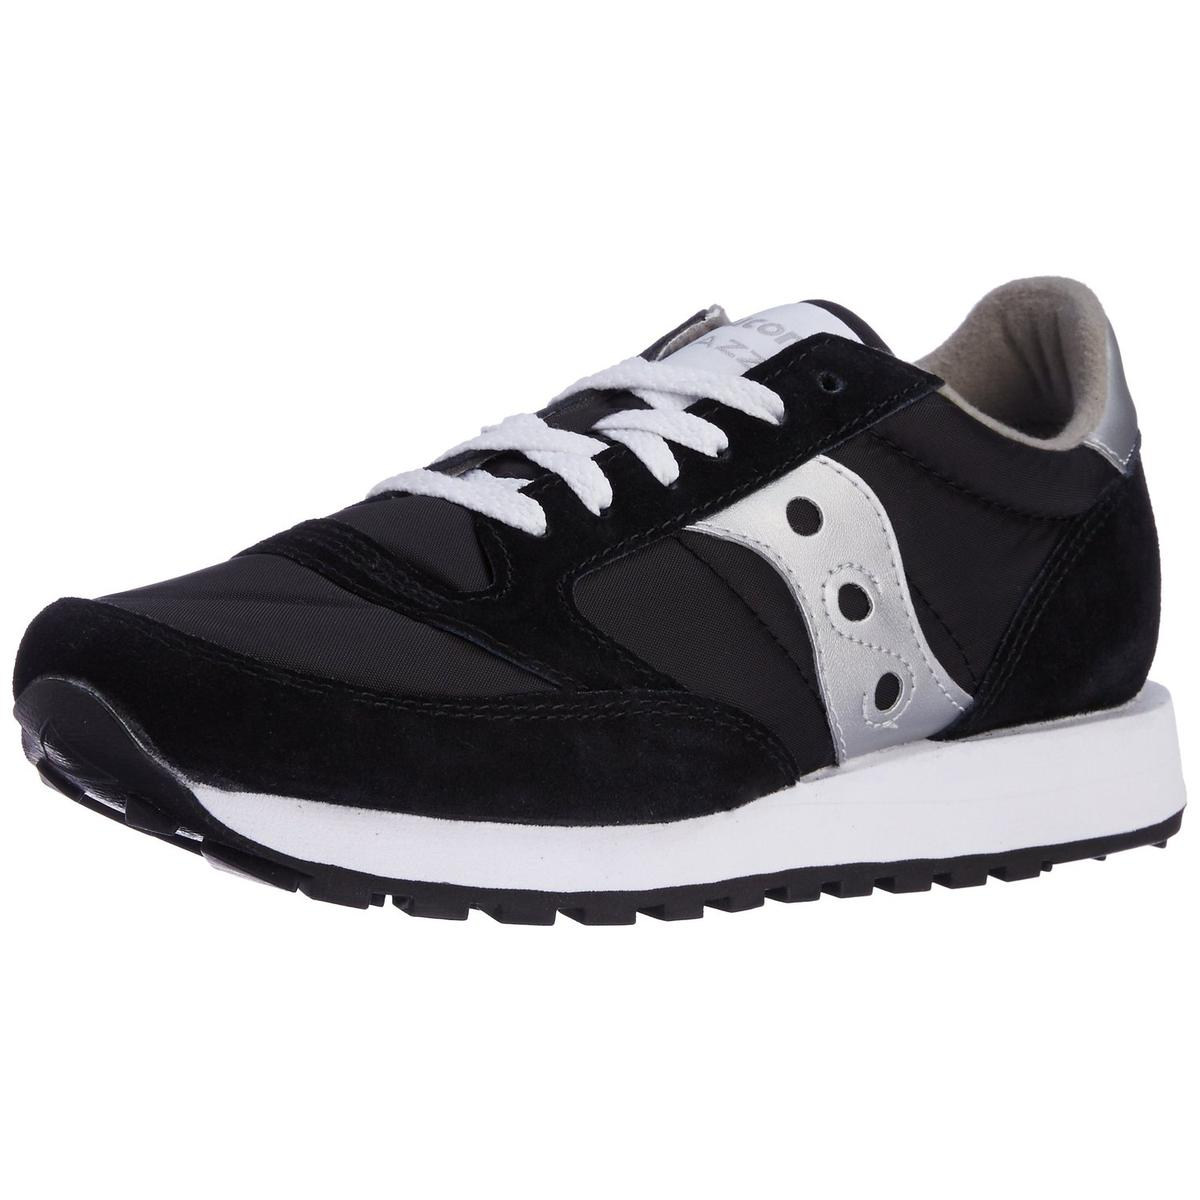 Saucony Jazz Original Mens Silver Black Sneakers by Saucony